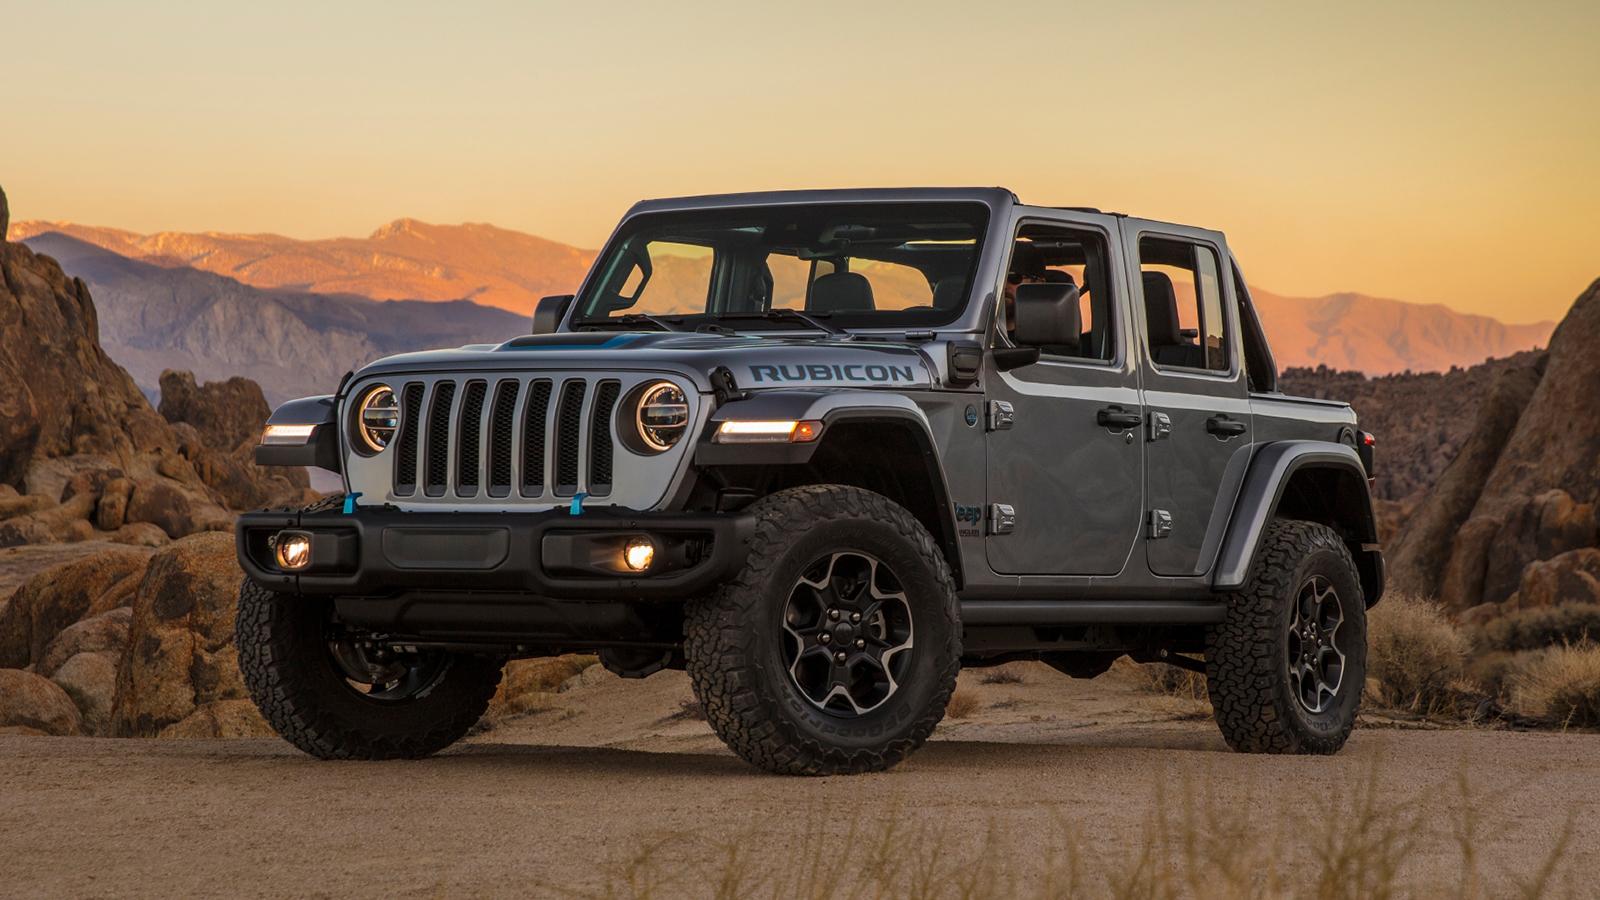 2021 jeep wrangler 4xe boasts most power, best fuel